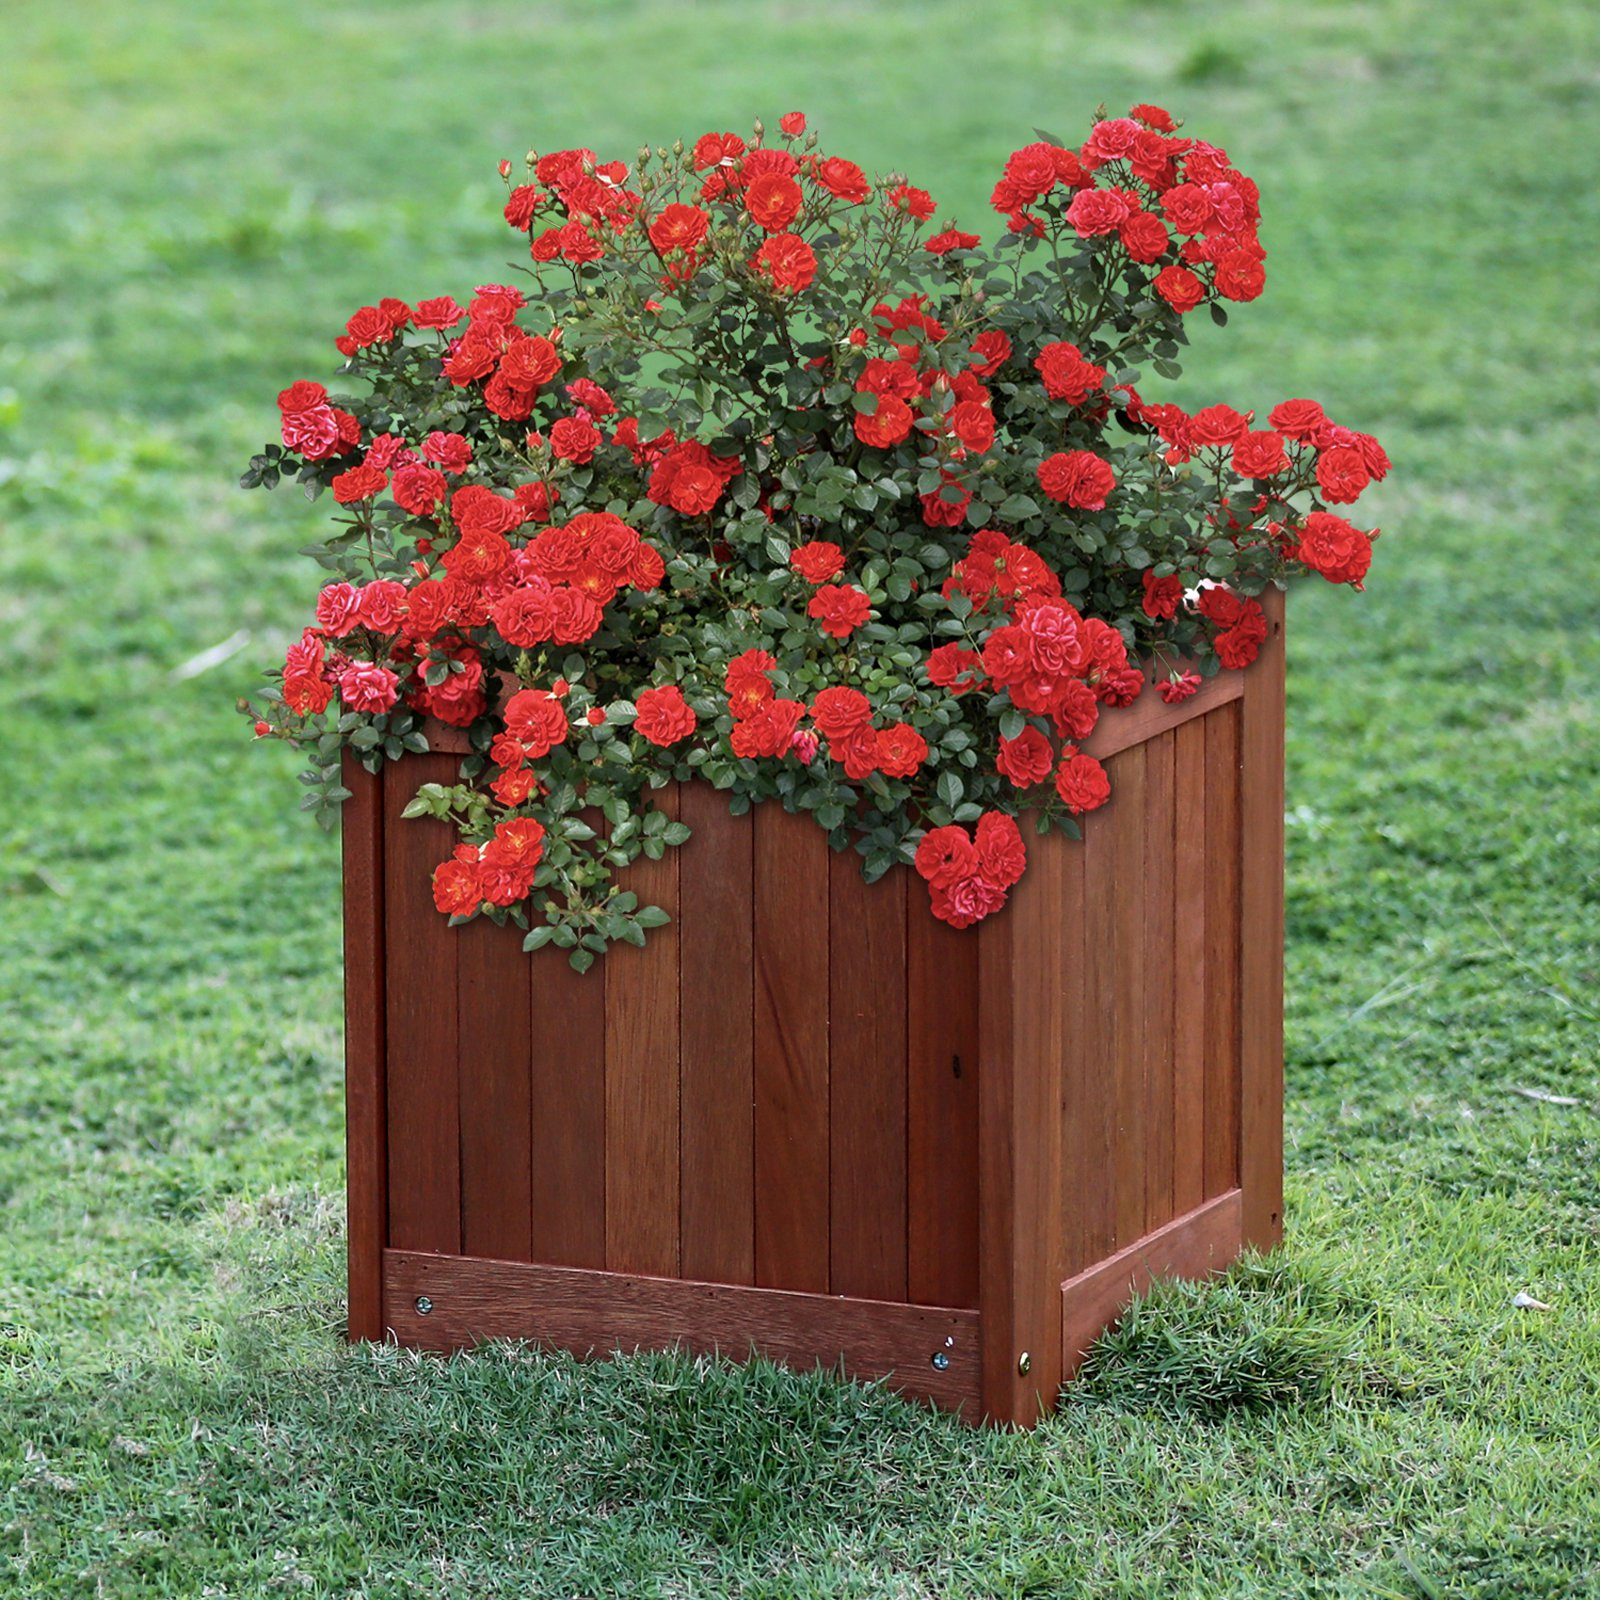 Furinno Tioman Teak Hardwood Flower Box by Furinno